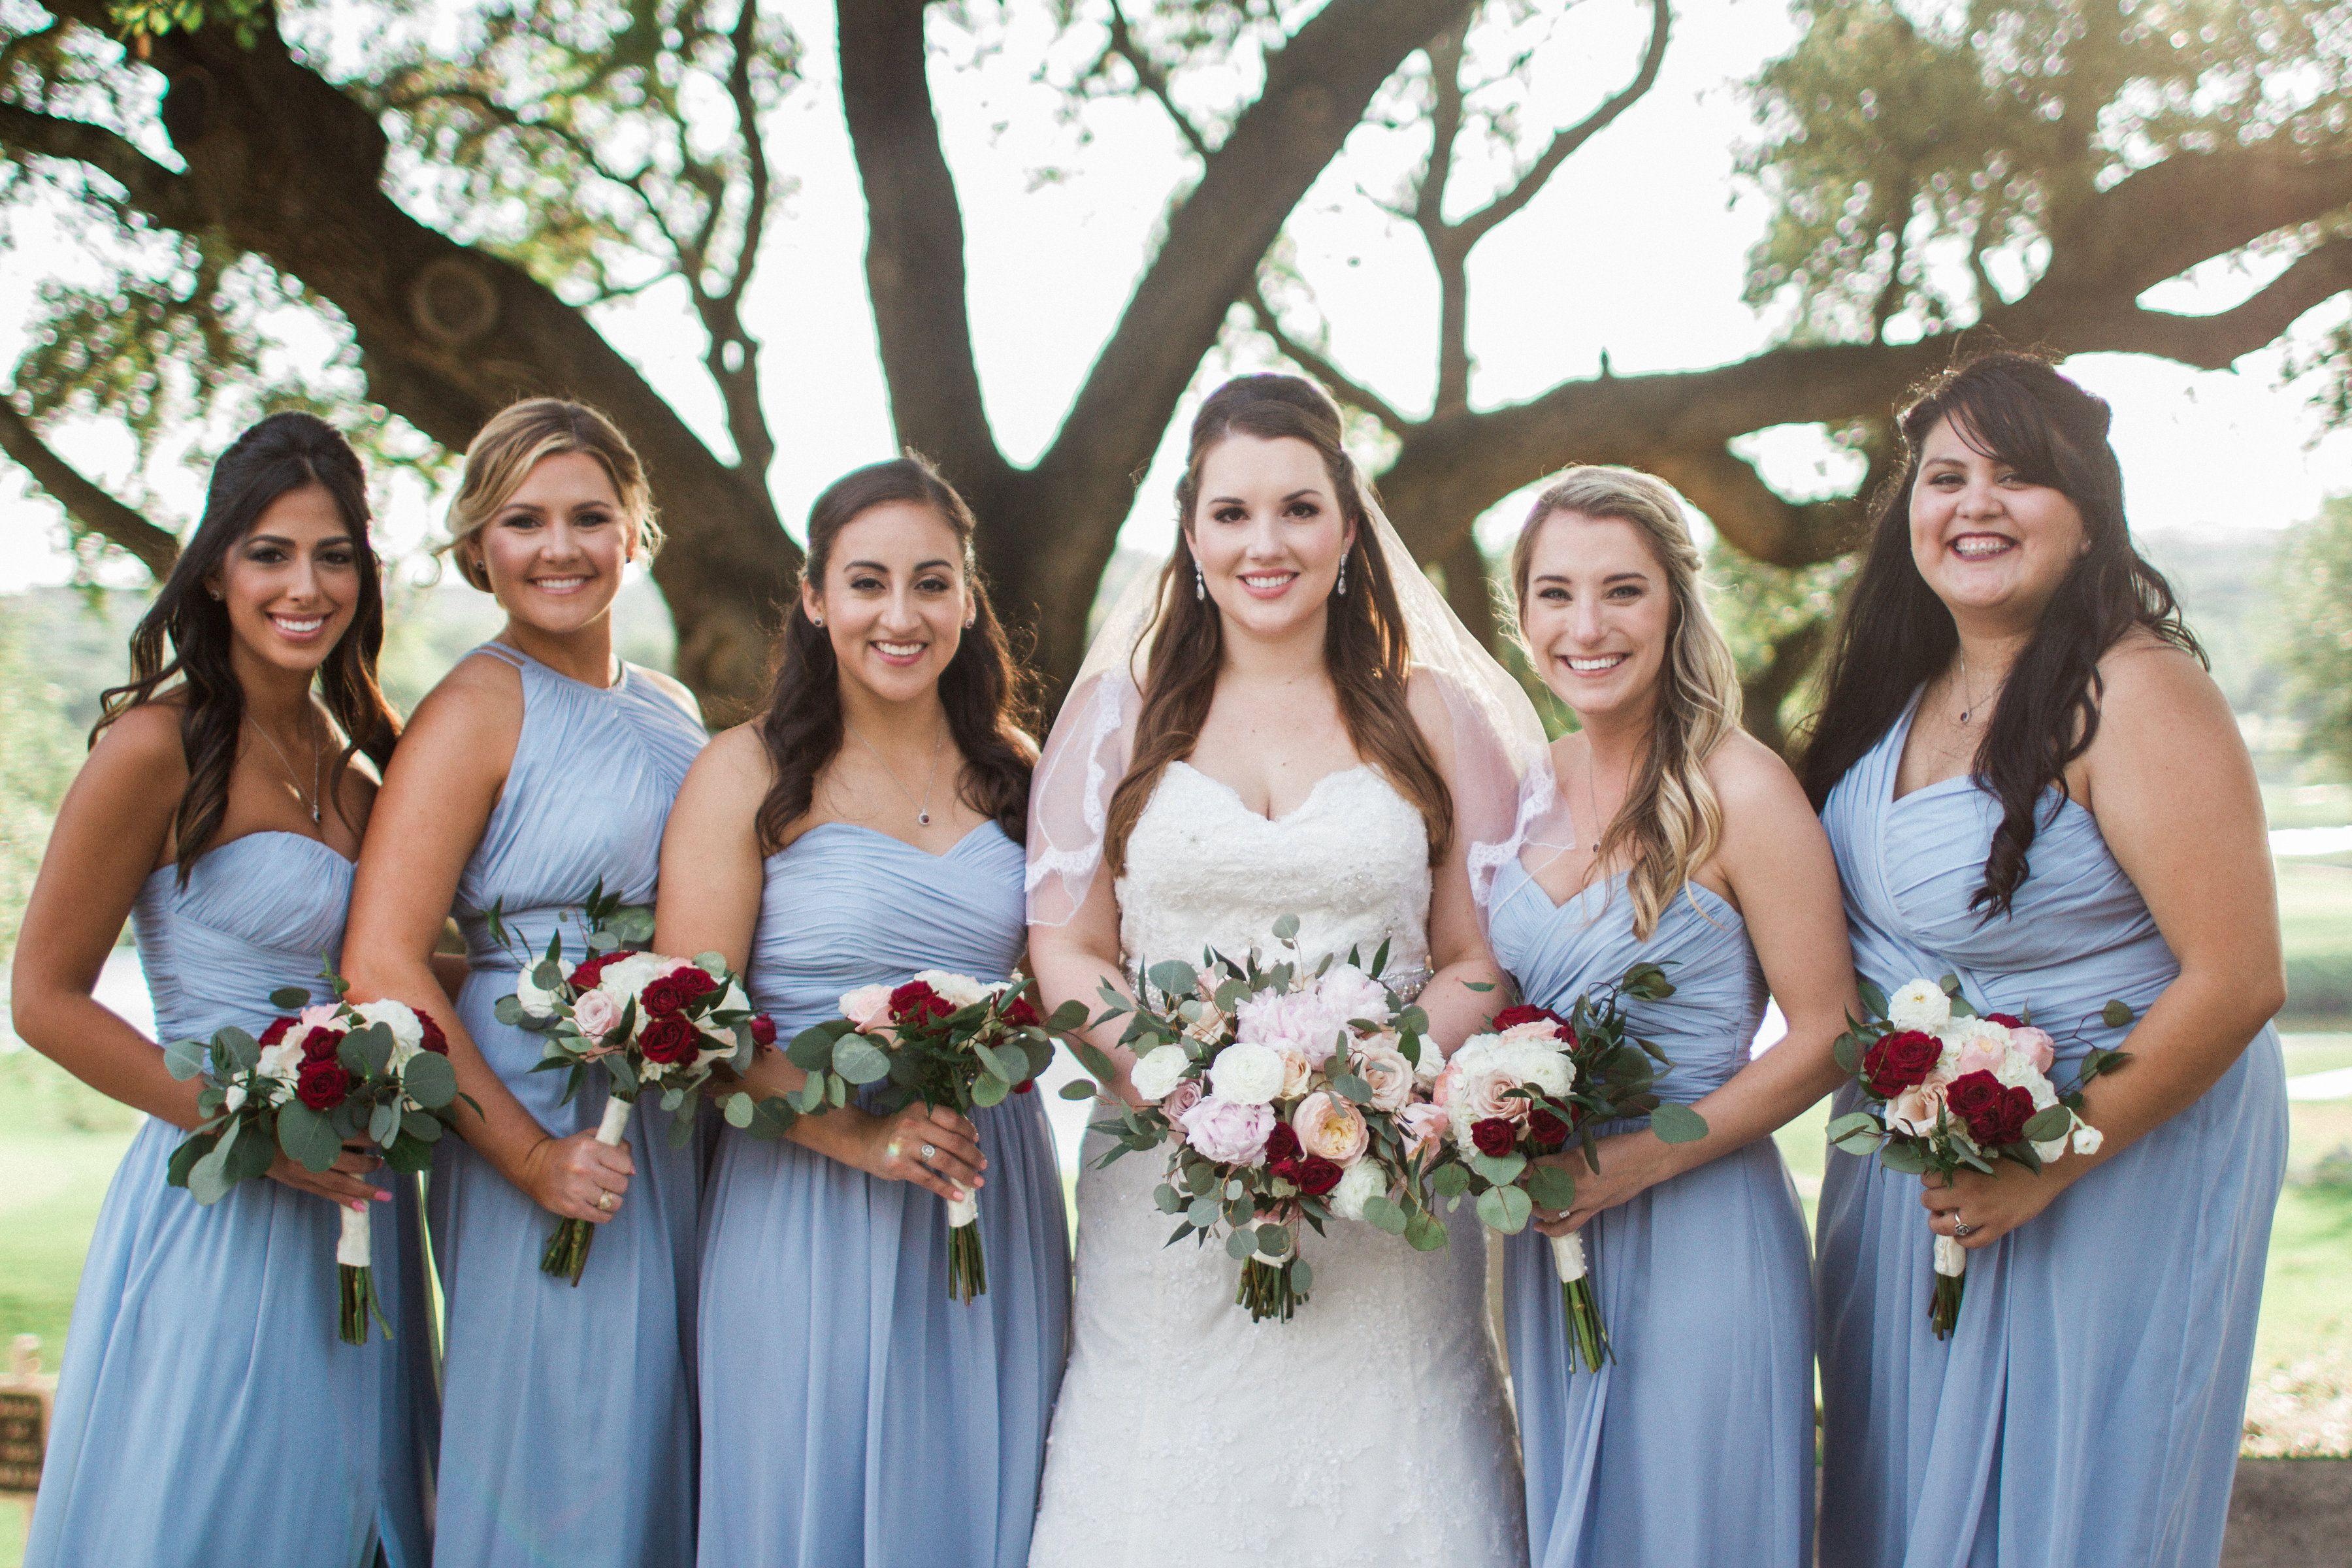 bhldn party light lighting bridesmaid a xl dress dresses blaise gowns blue bridal zoom